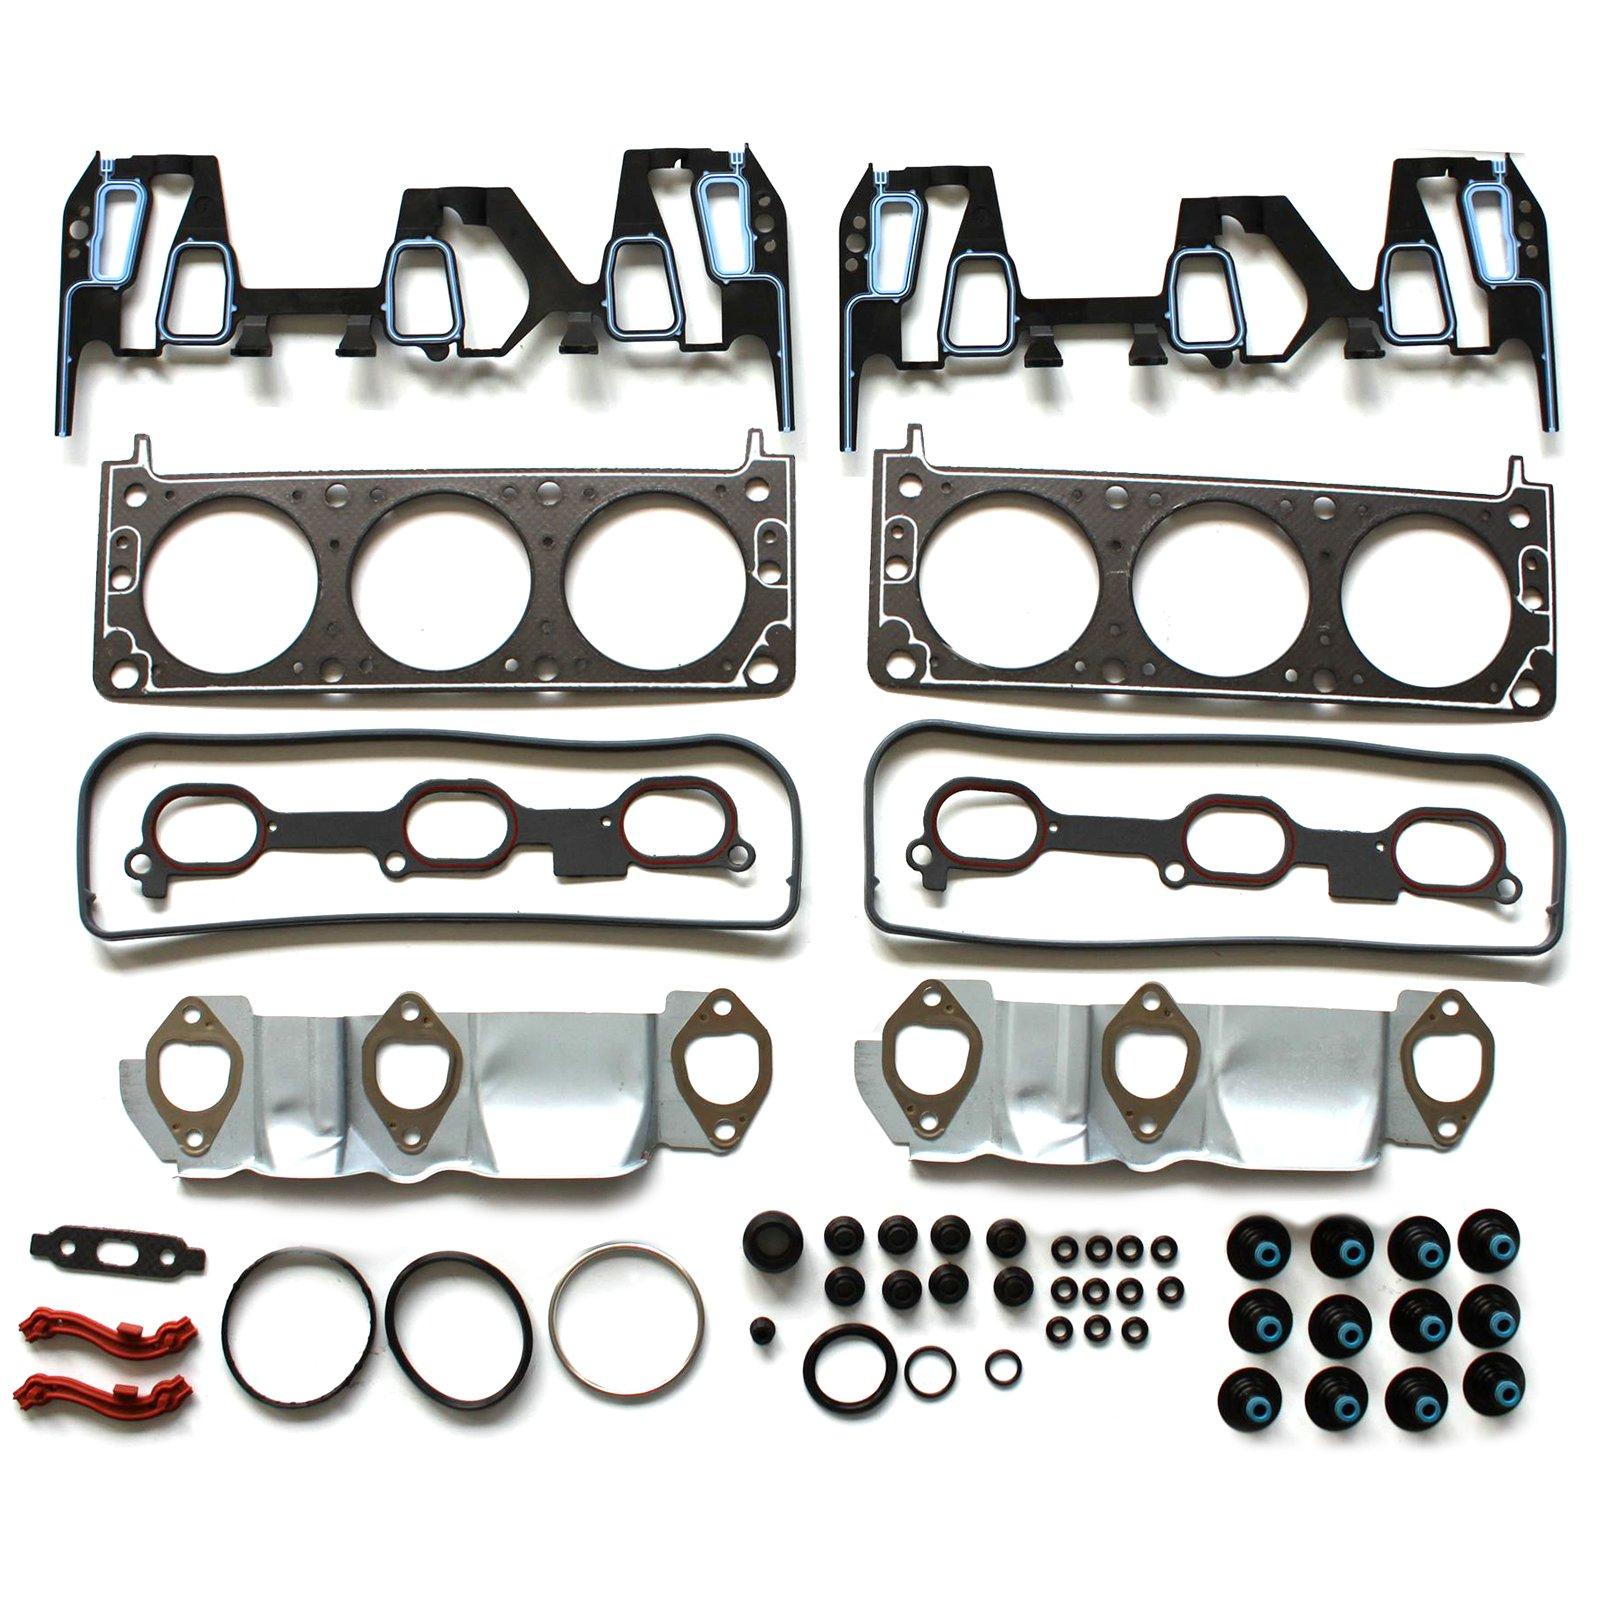 ECCPP Compatible fit for Head Gasket Set 2005-2009 Chevrolet Equinox Pontiac Torrent 3.4L Automotive Replacement Engine Head Gaskets Kit